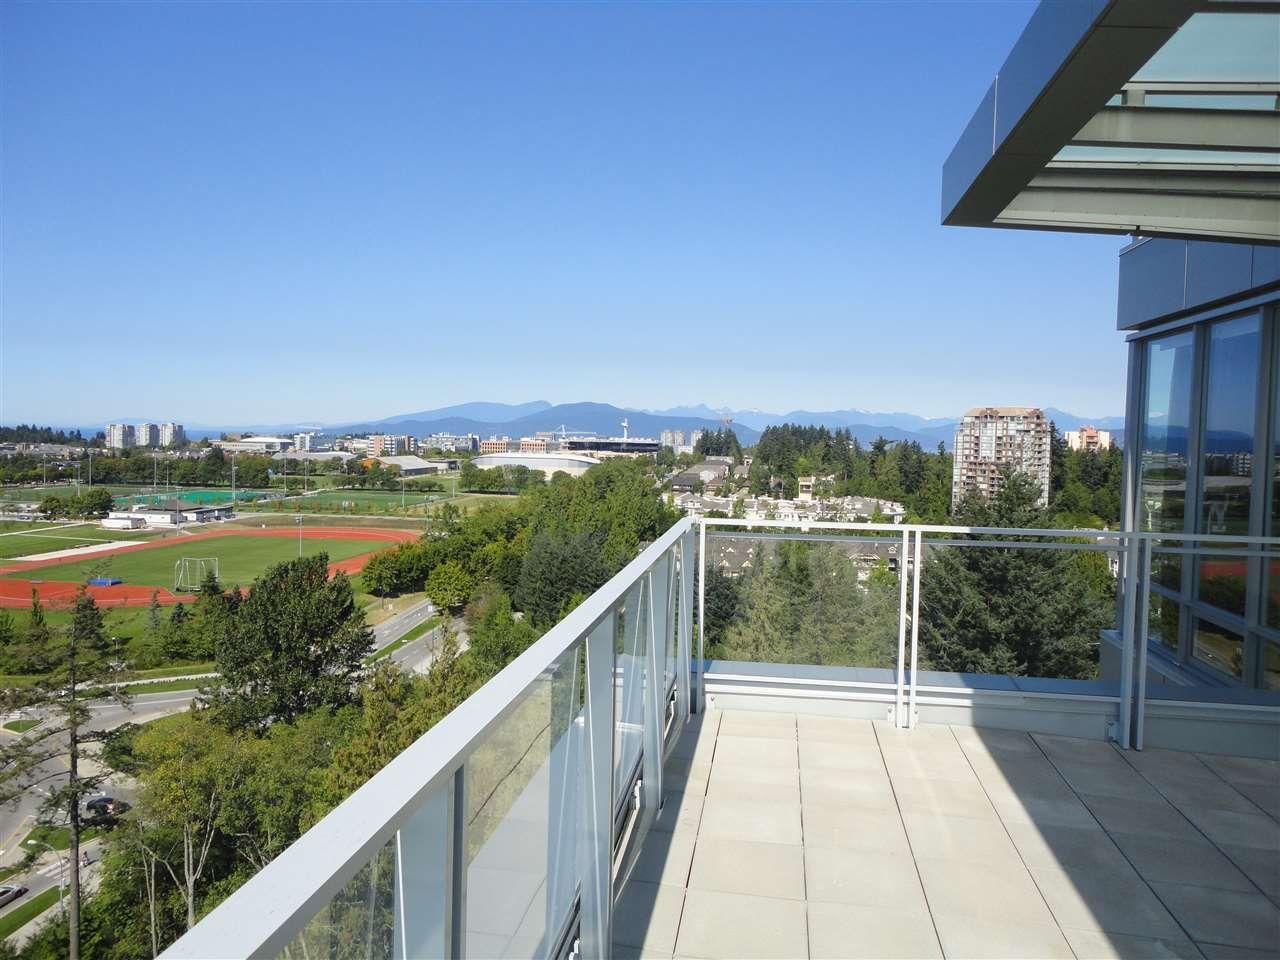 "Photo 10: Photos: 1600 5838 BERTON Avenue in Vancouver: University VW Condo for sale in ""WESBROOK"" (Vancouver West)  : MLS®# R2239956"